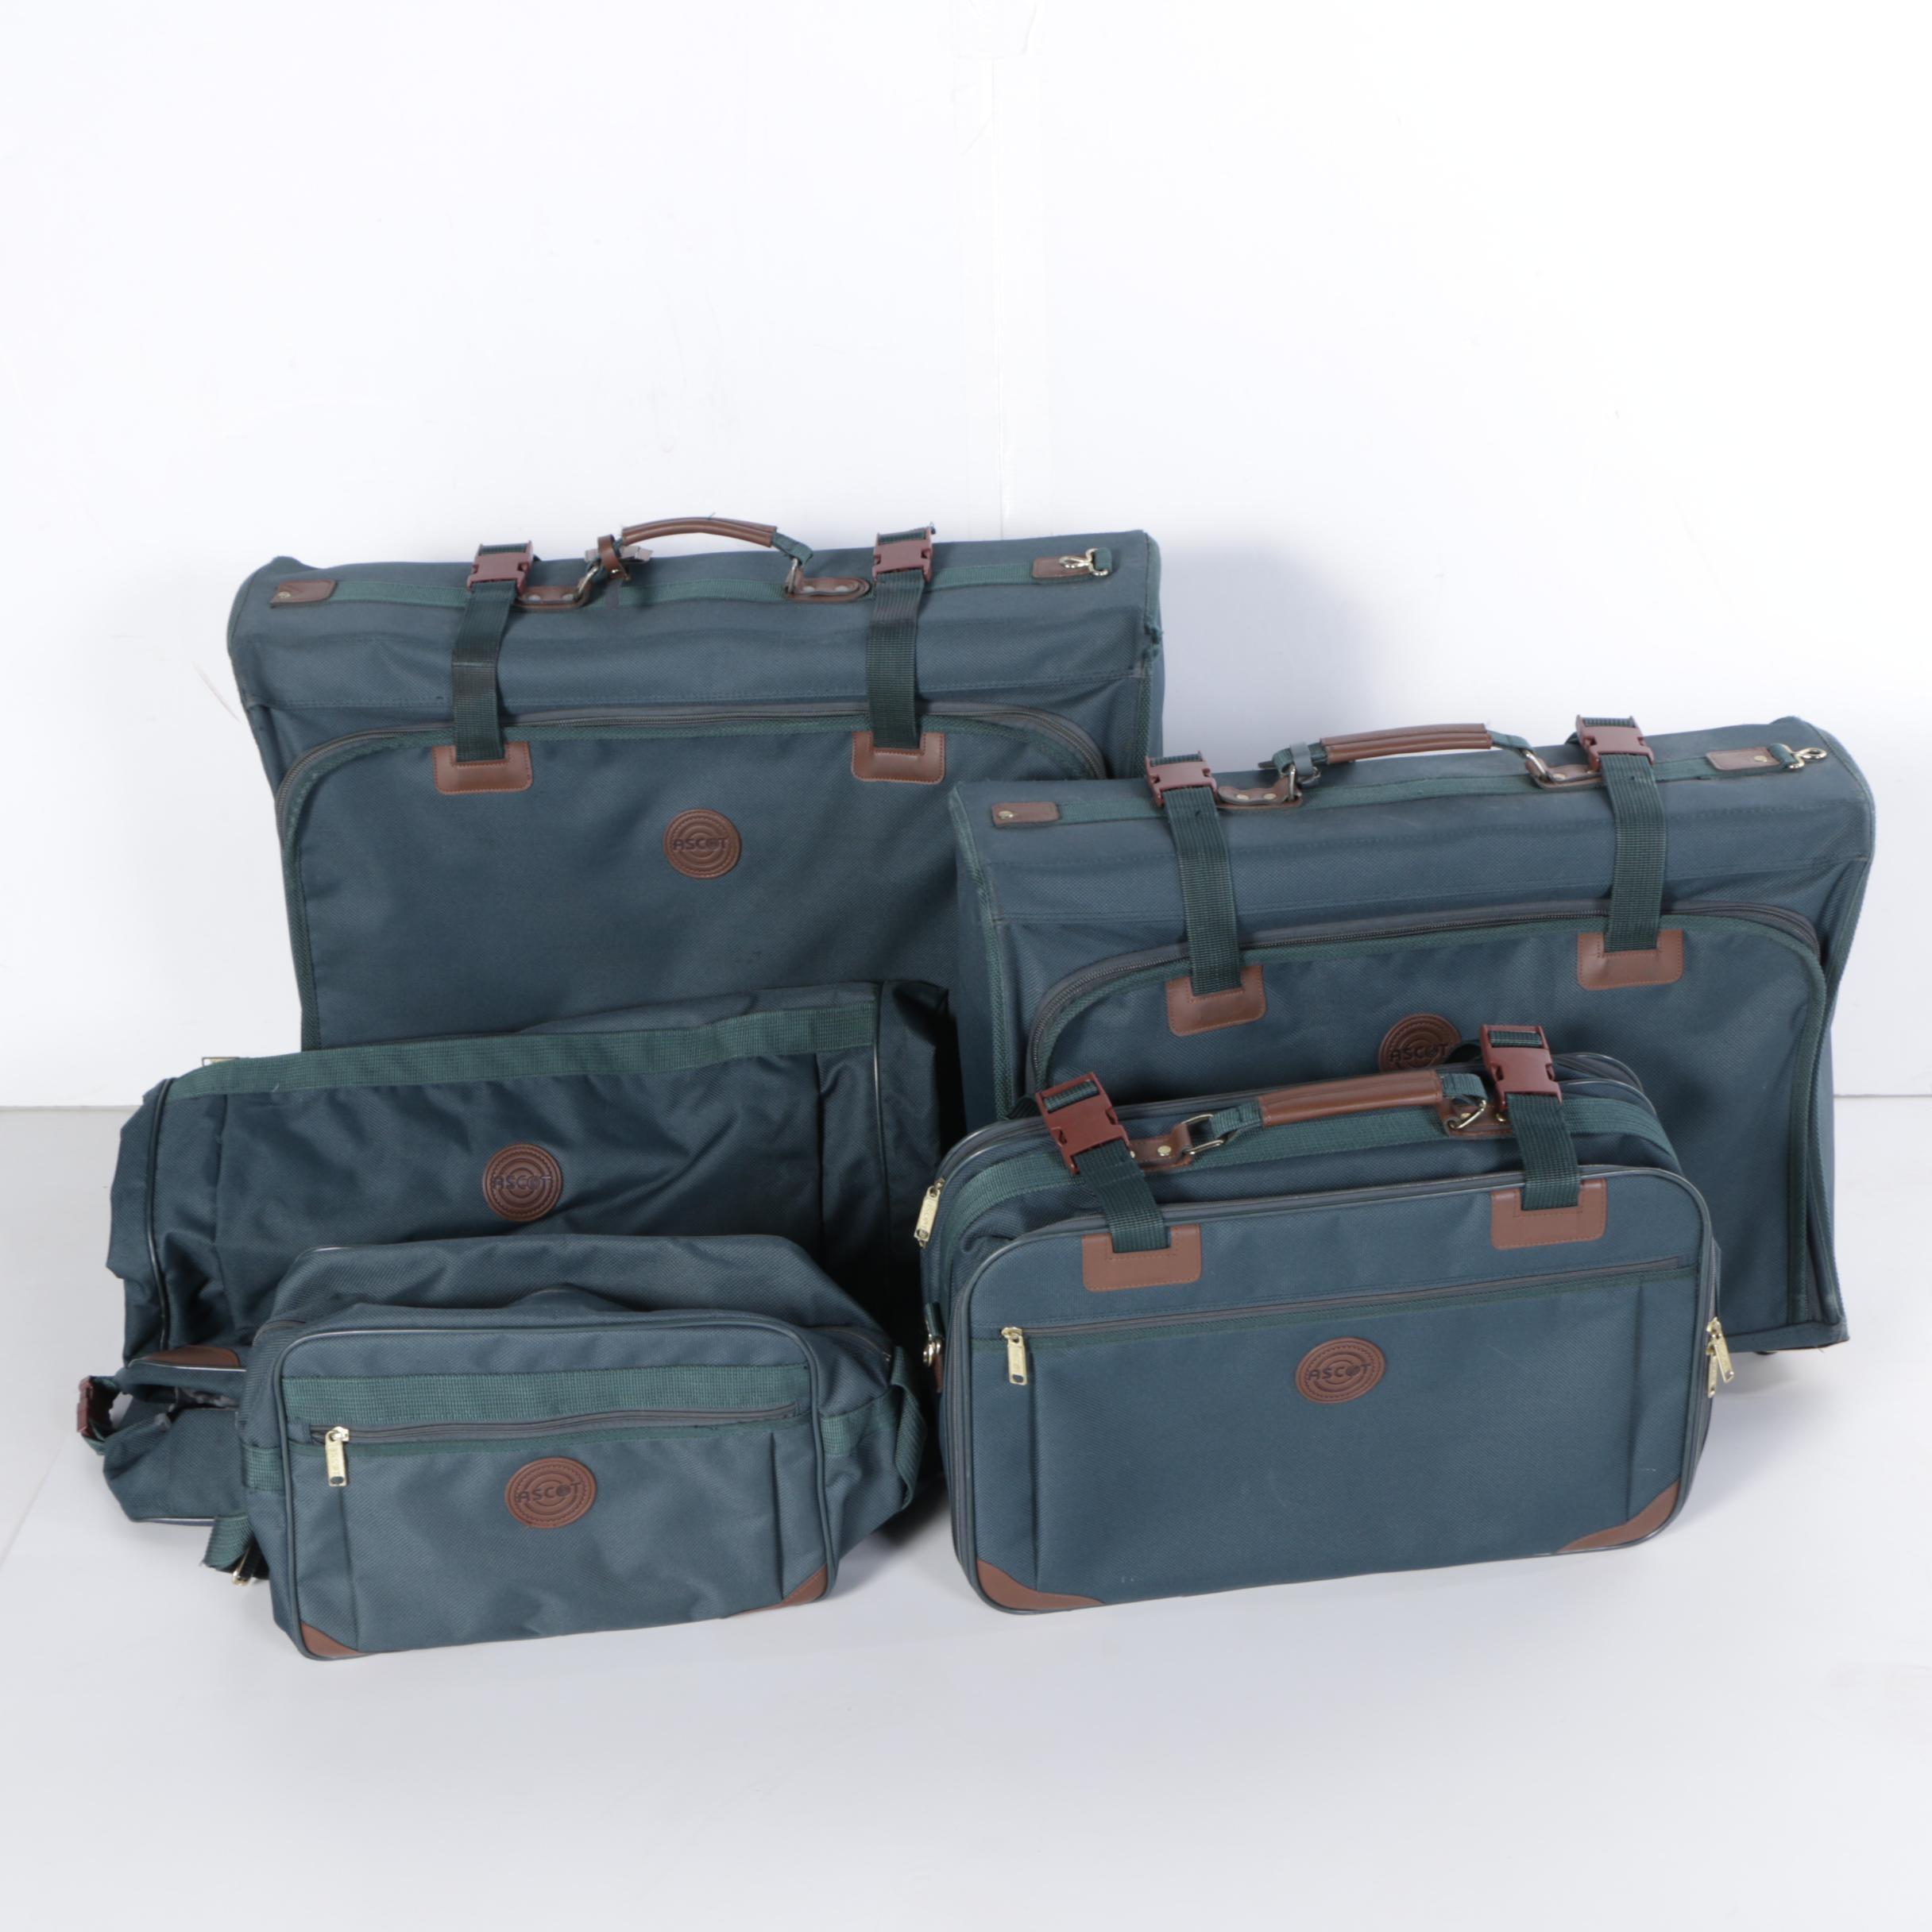 Ascot Five Piece Luggage Set